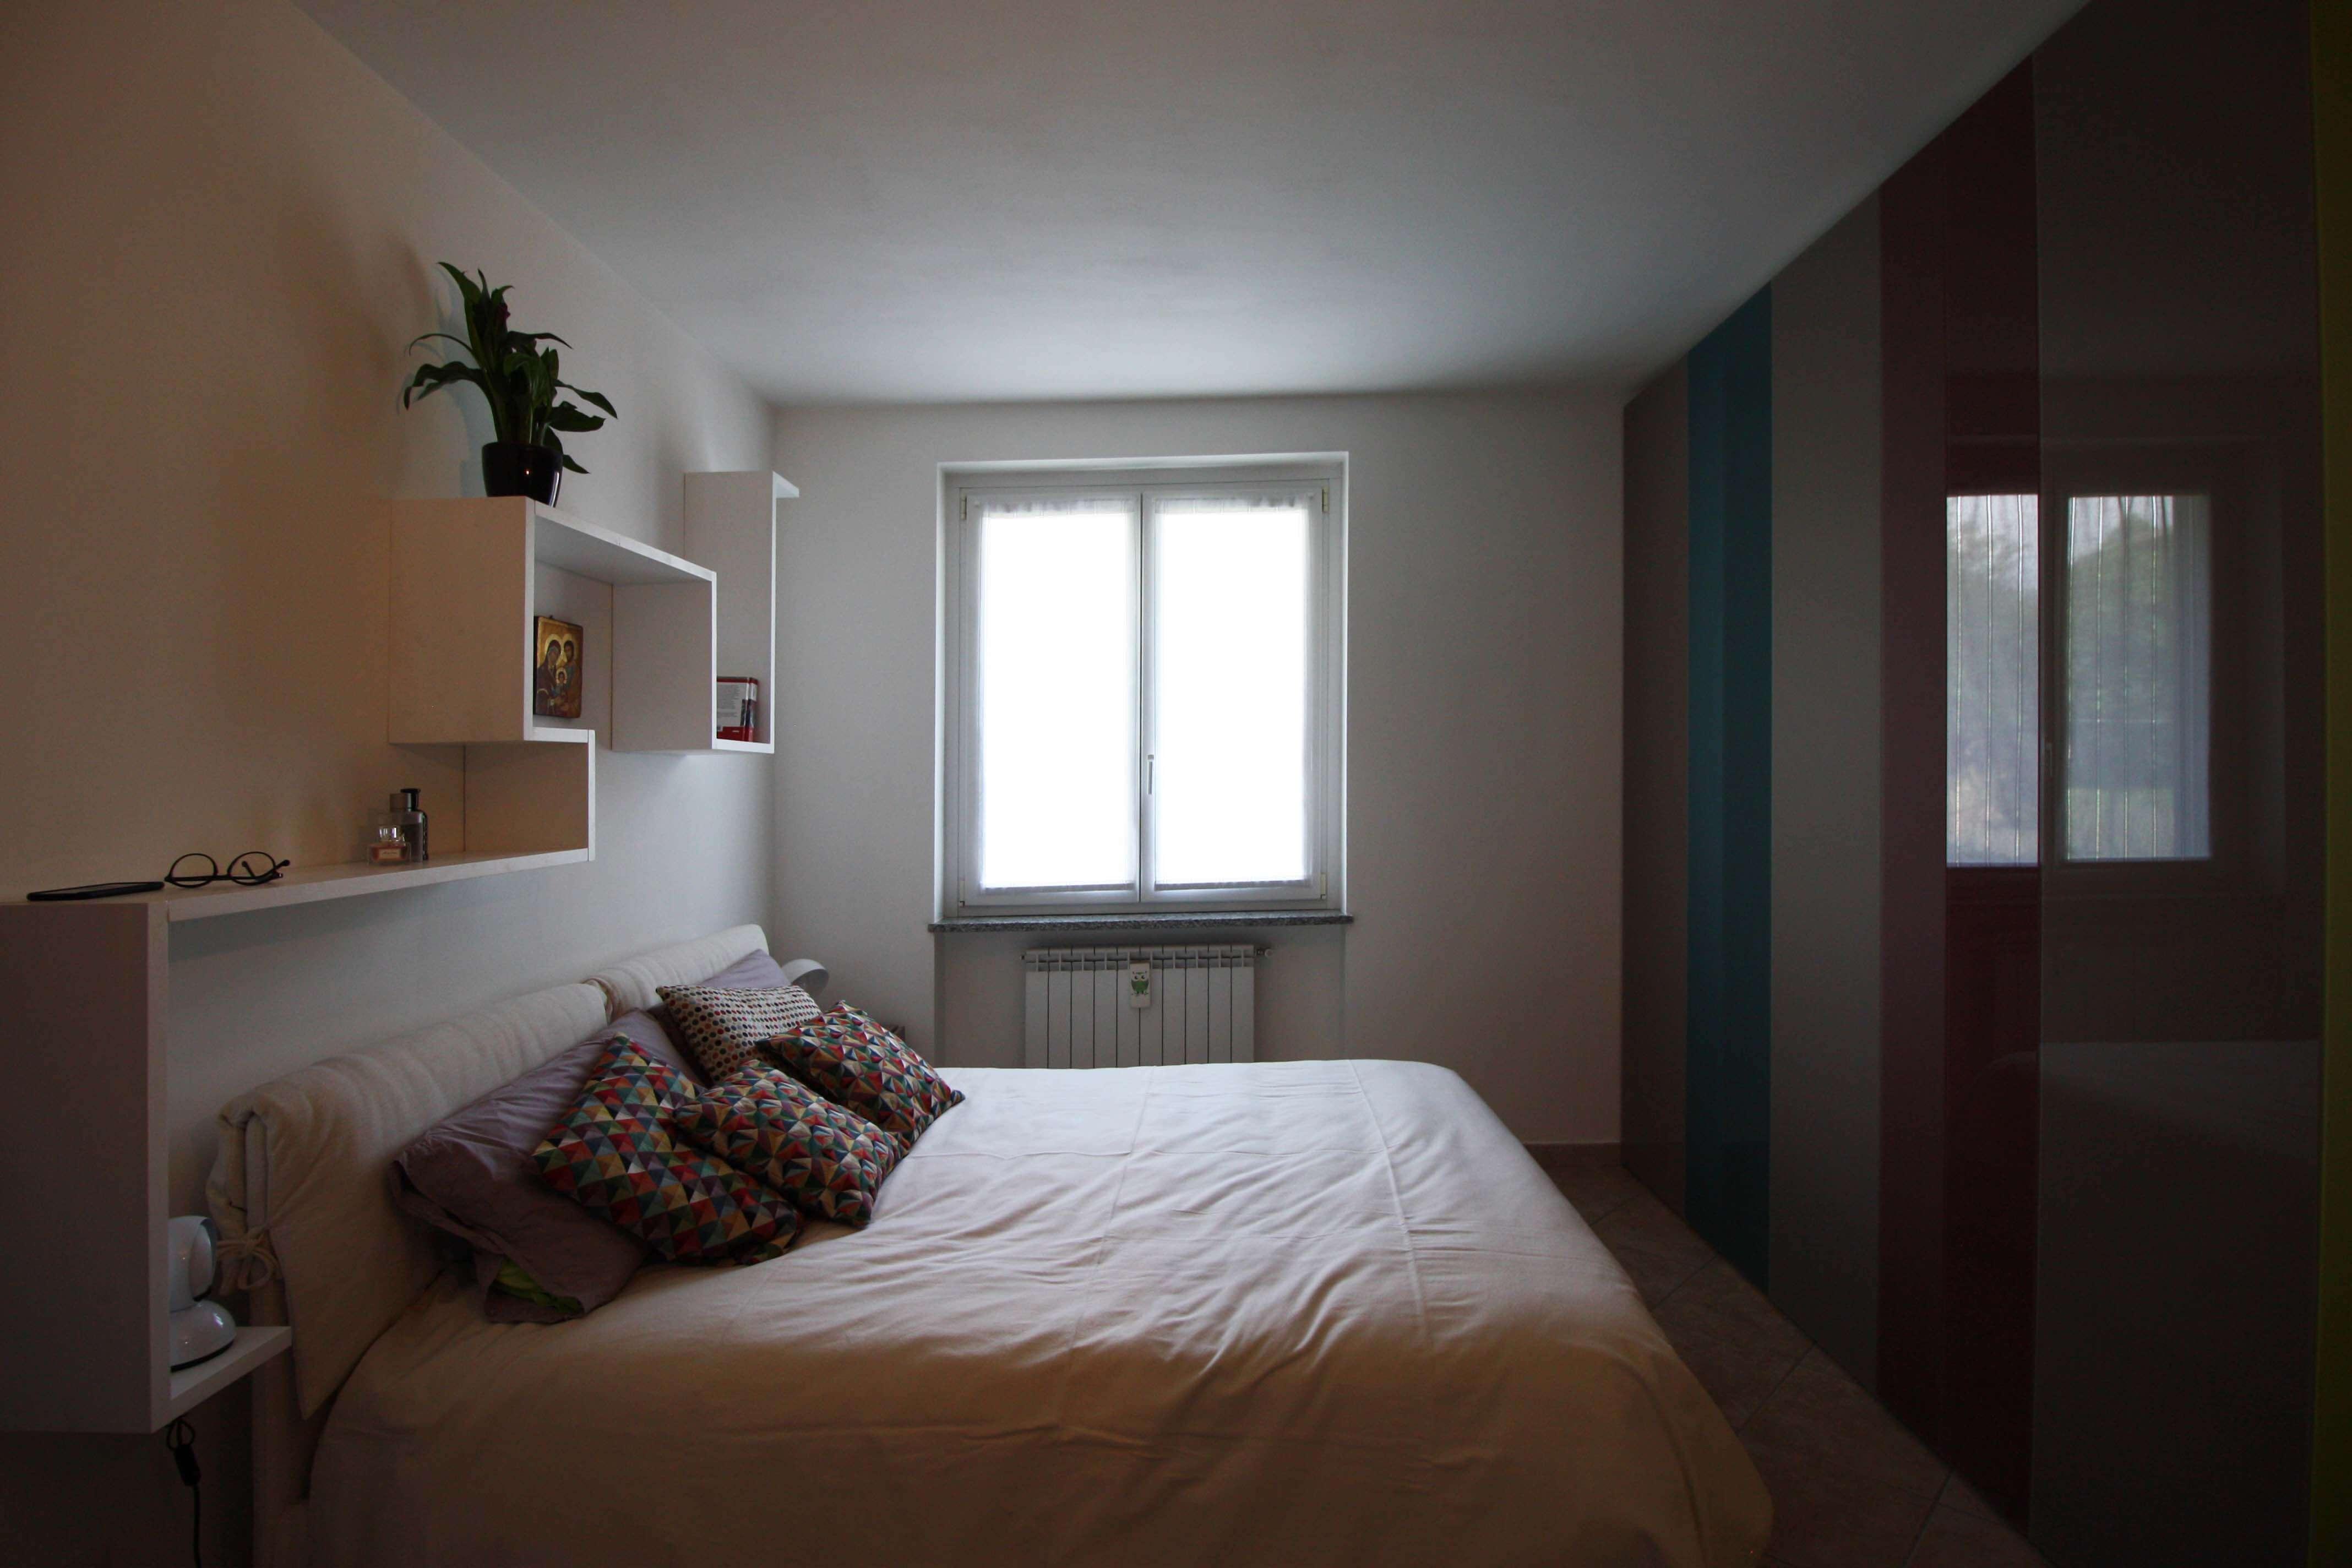 elisa_macchi_camera_es_vista_finestra